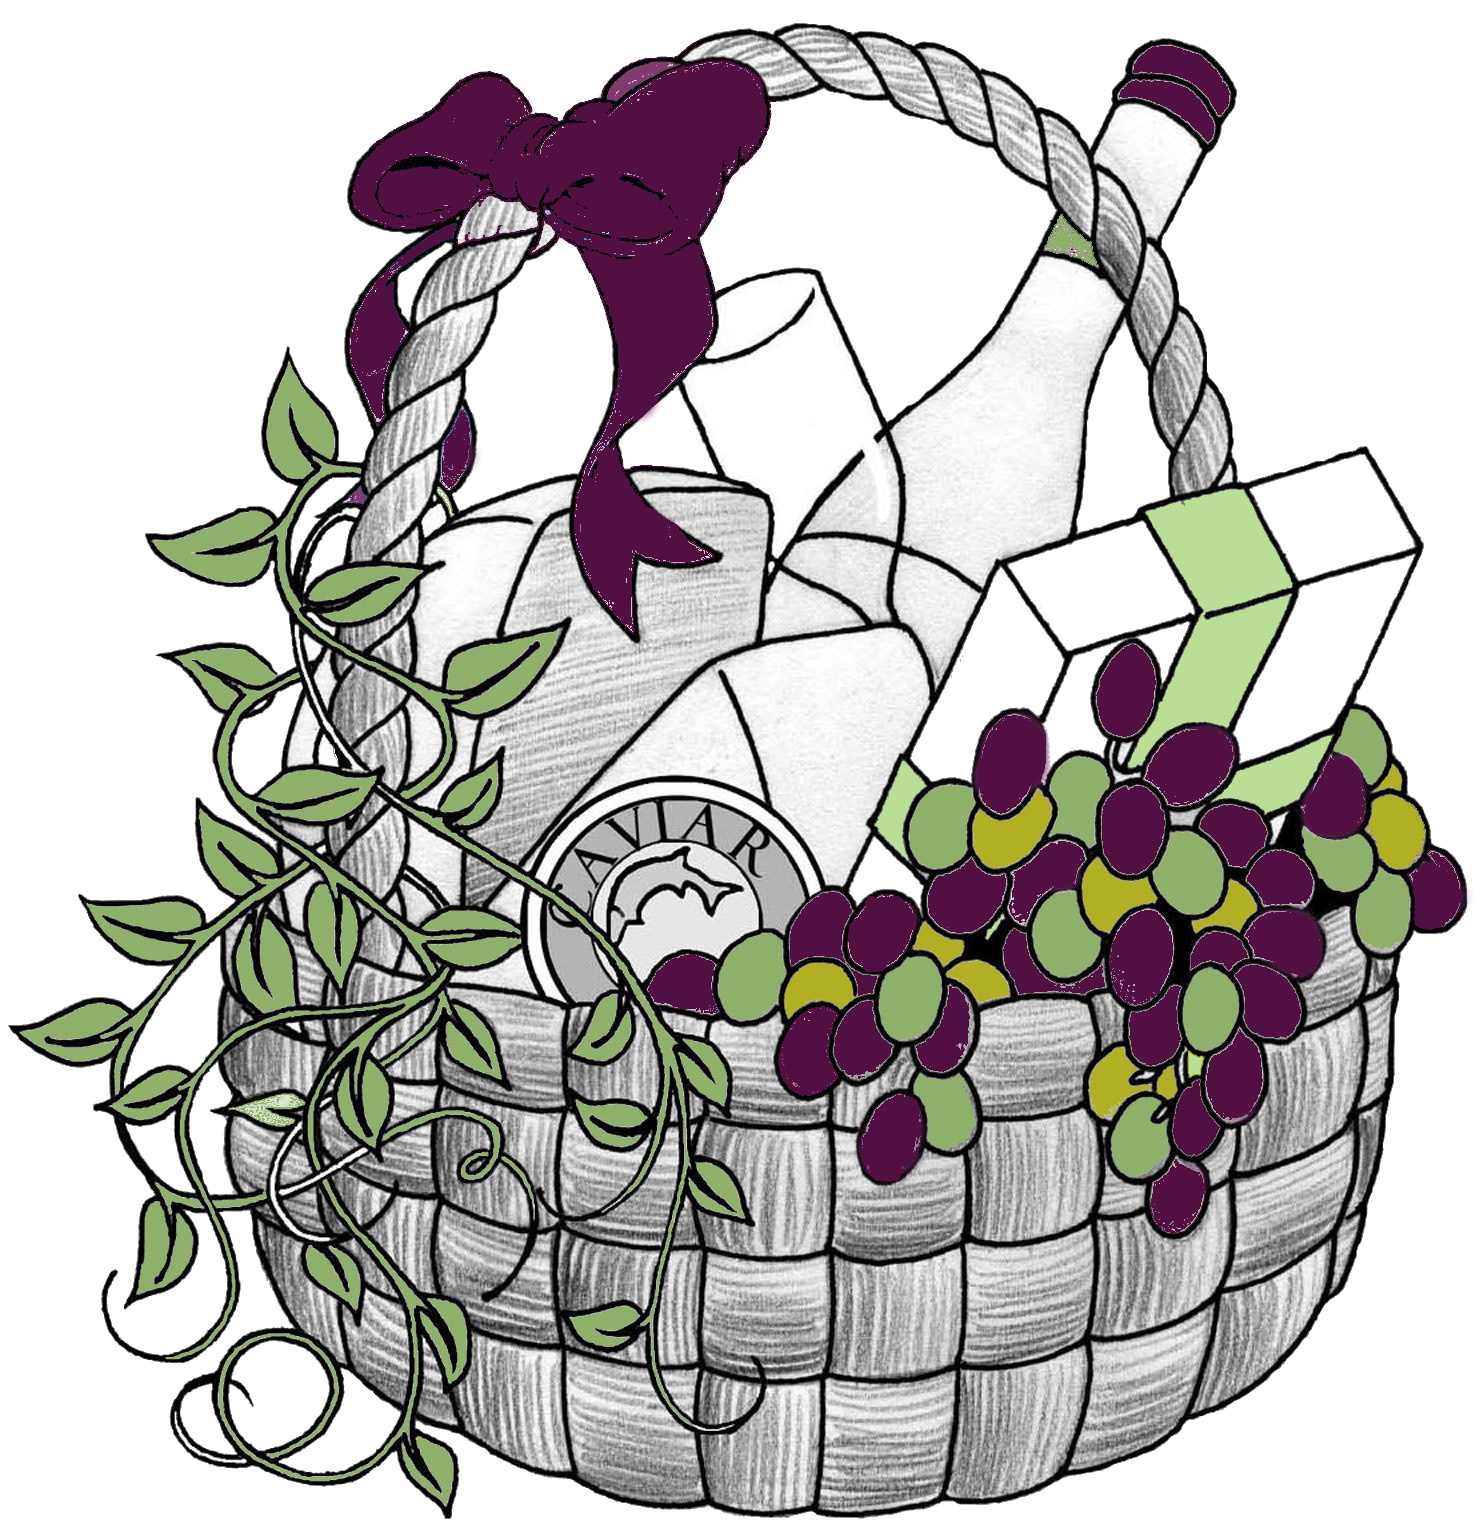 gift-basket-png-for-baskets-clipart-free-clip-art-images - Niskayuna  Reformed Church